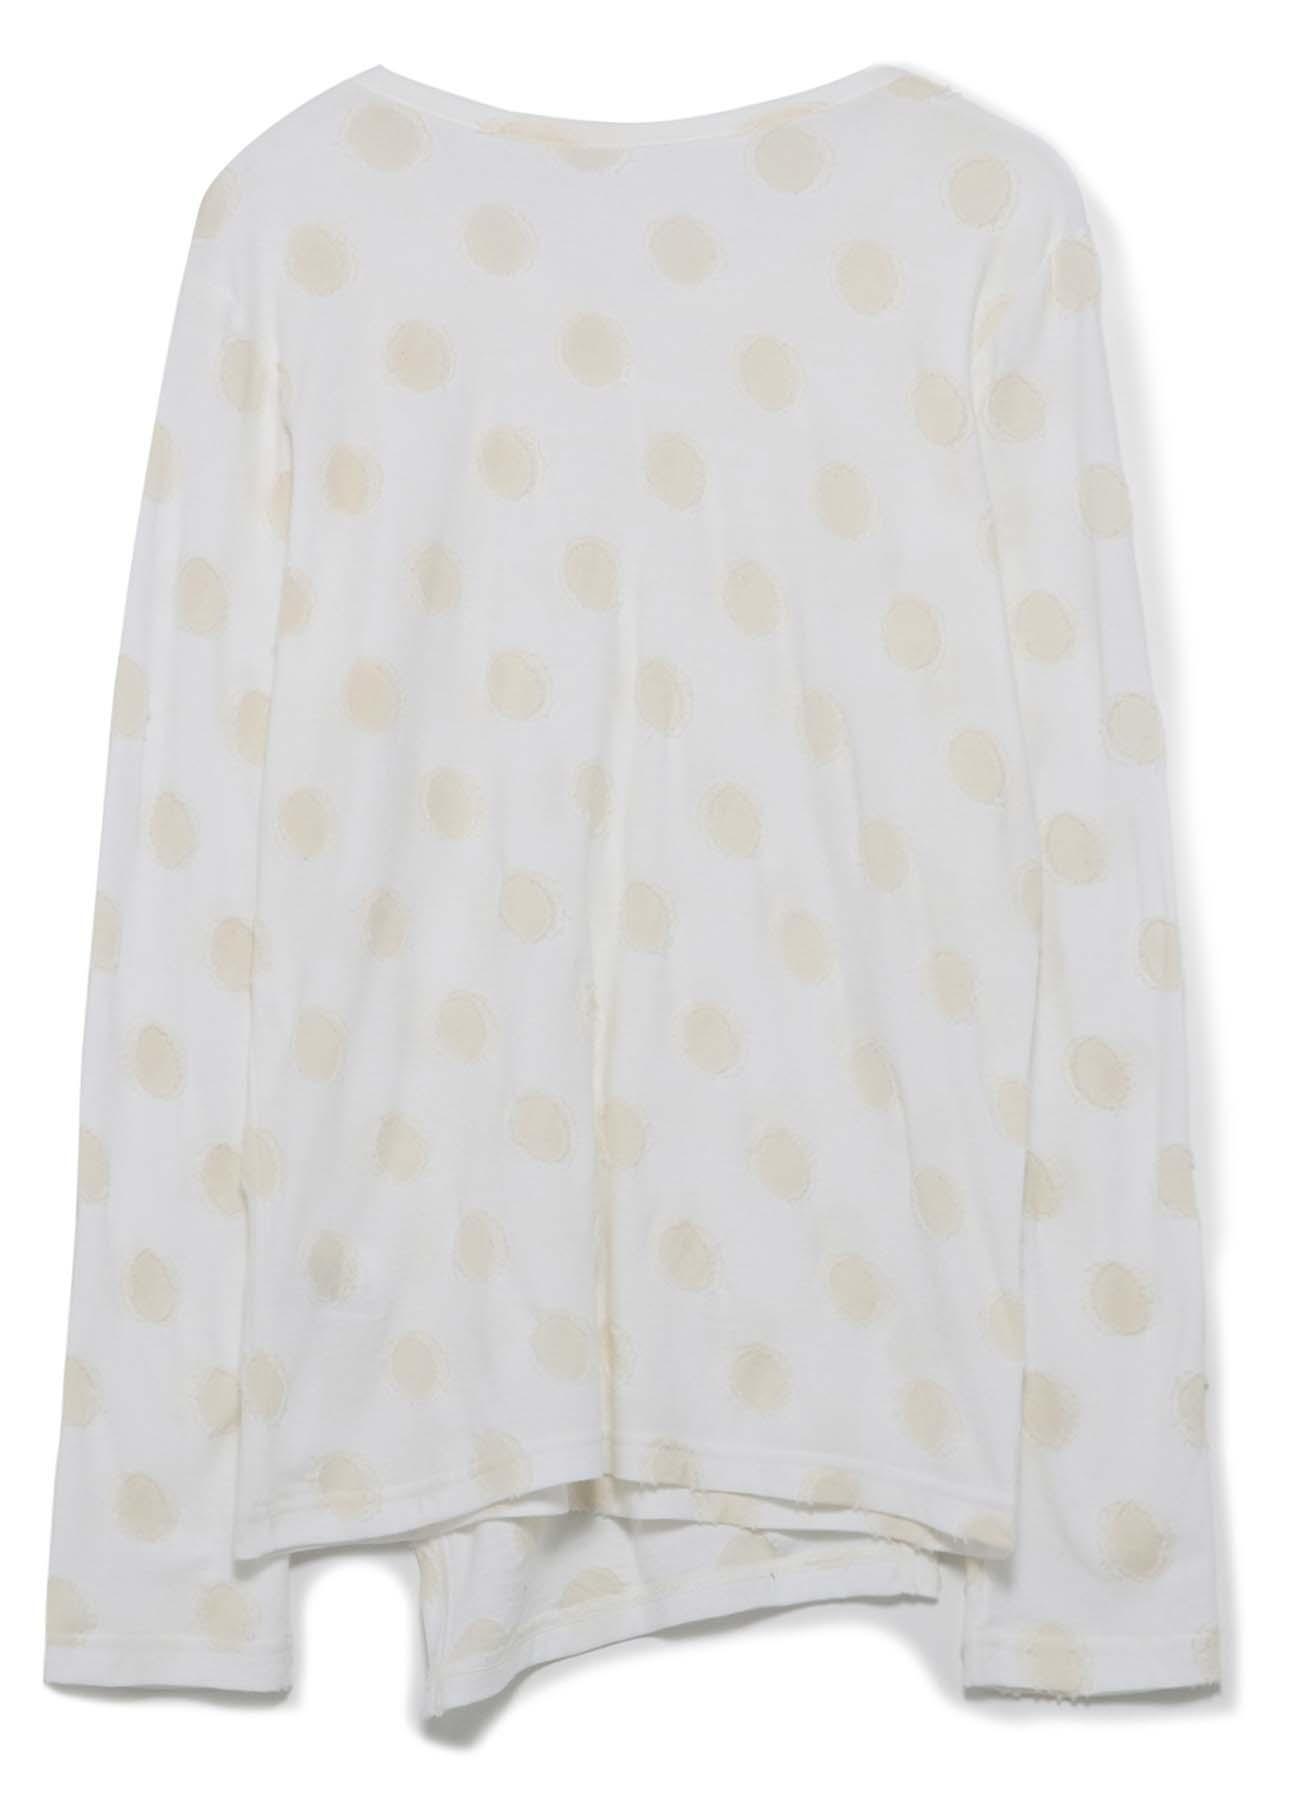 DOT CUT JACQUARD FRONT LAYERED DECO CLOTH T-SHIRT